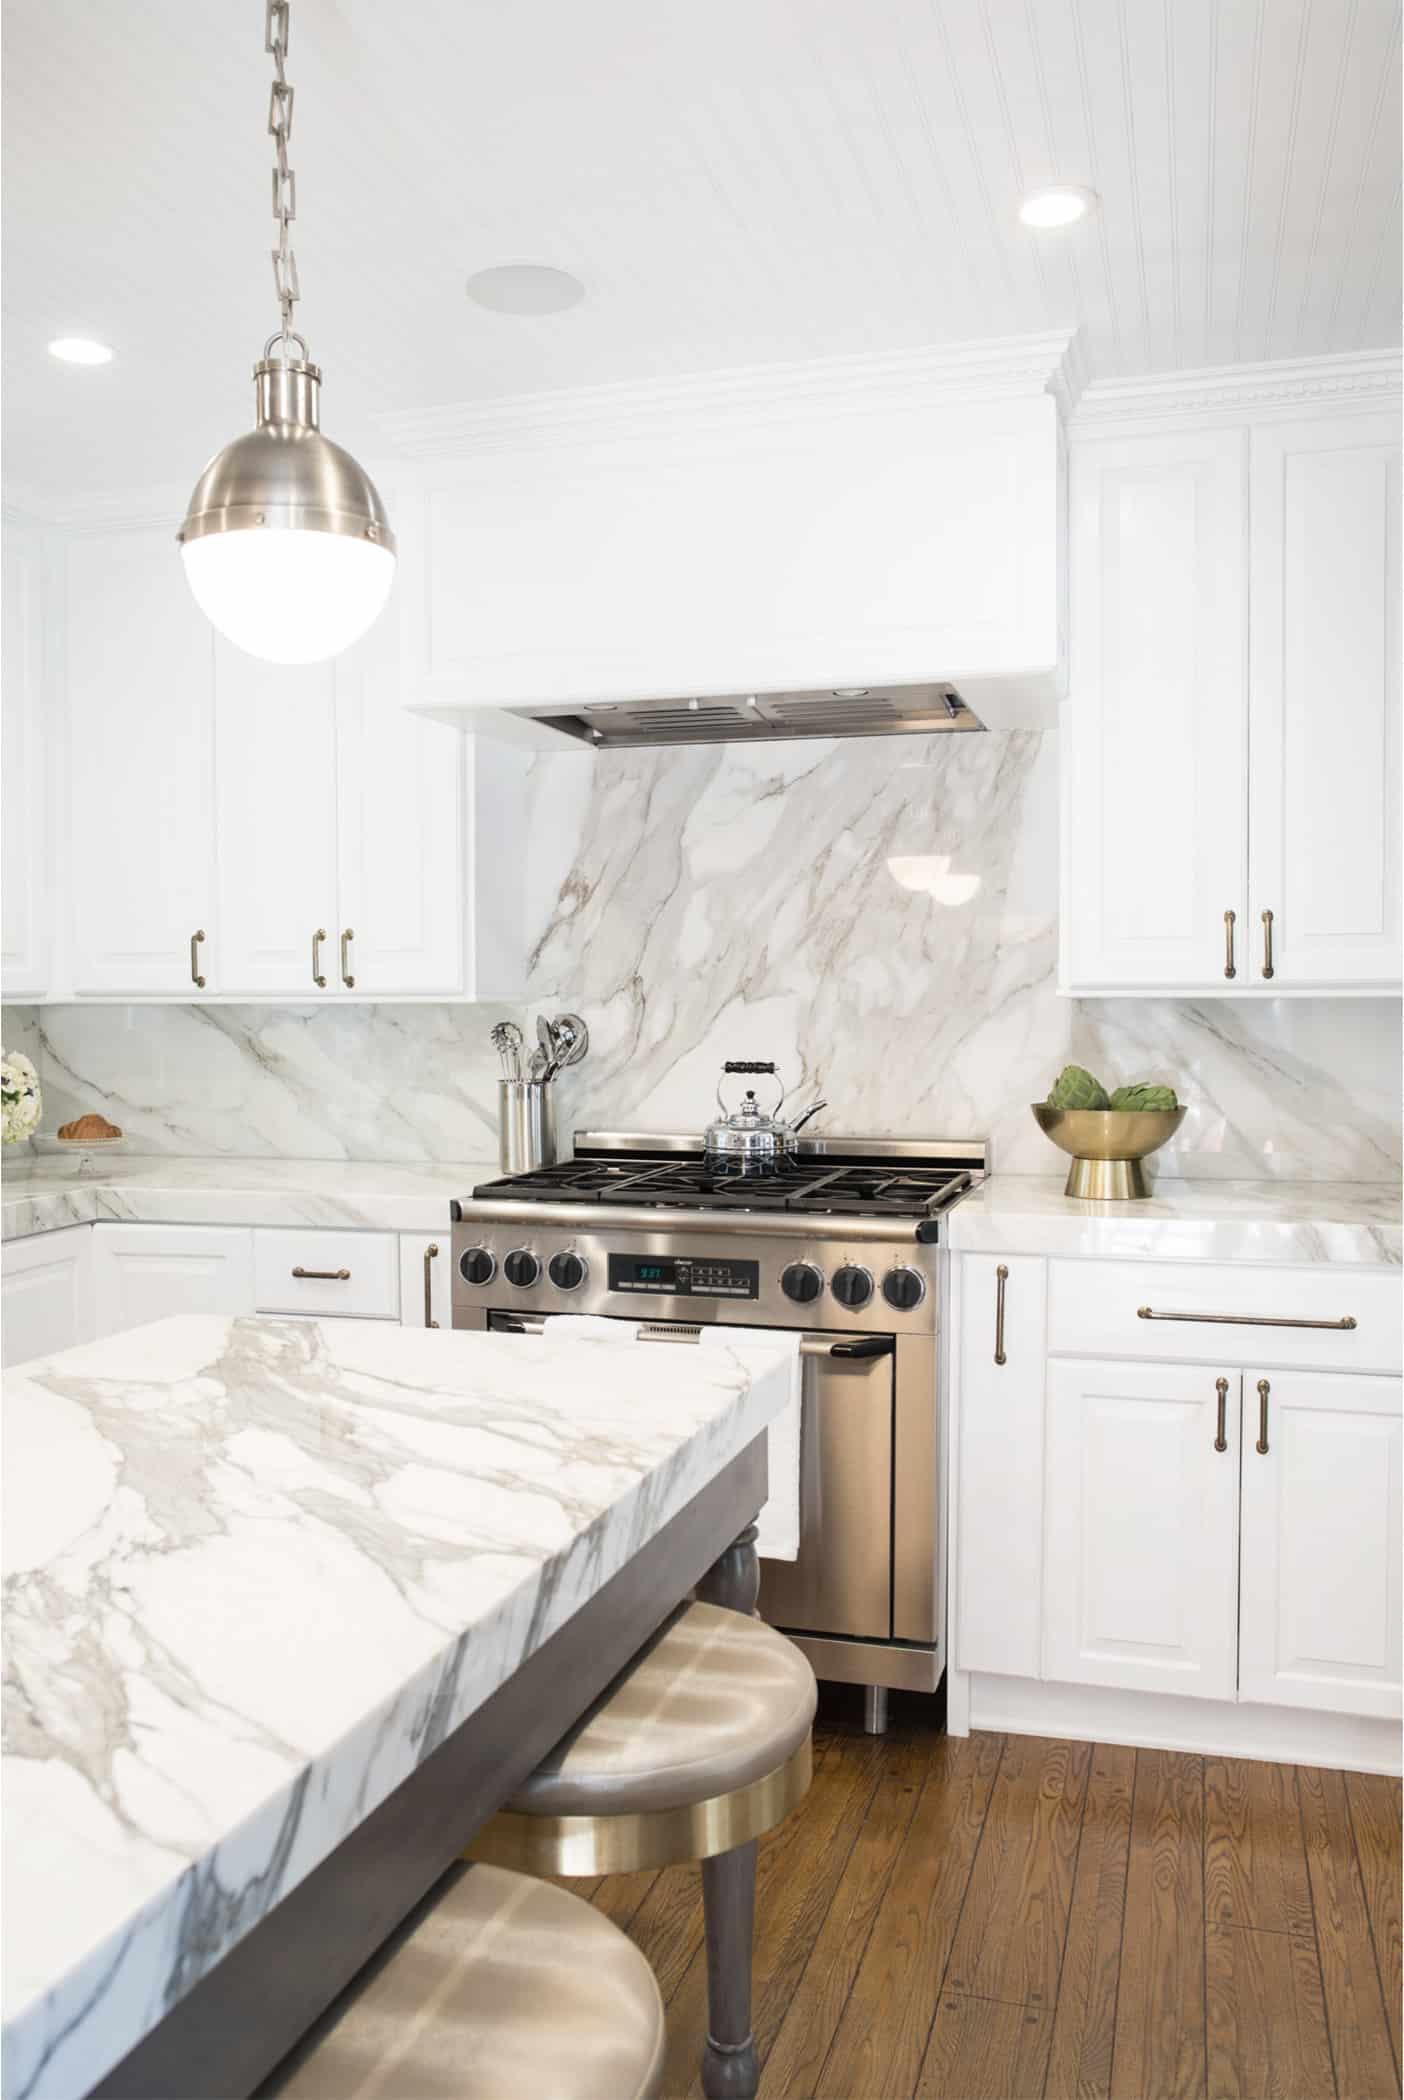 Designer Kitchen Remodel Budget Details | COCOCOZY